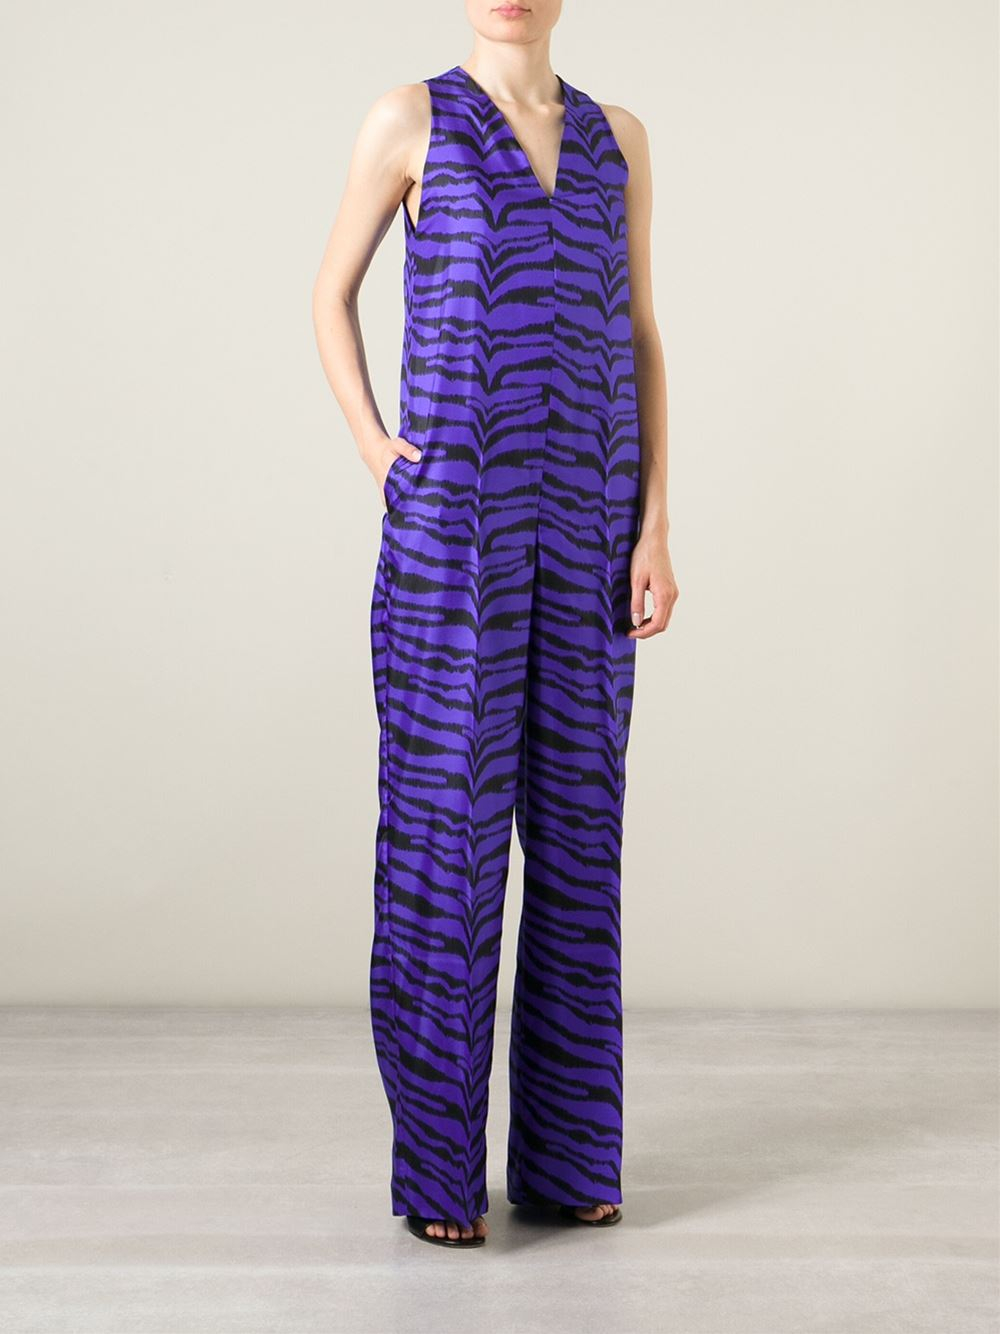 4ee23d5c7531 Lyst - Emanuel Ungaro Zebra Print Jumpsuit in Blue